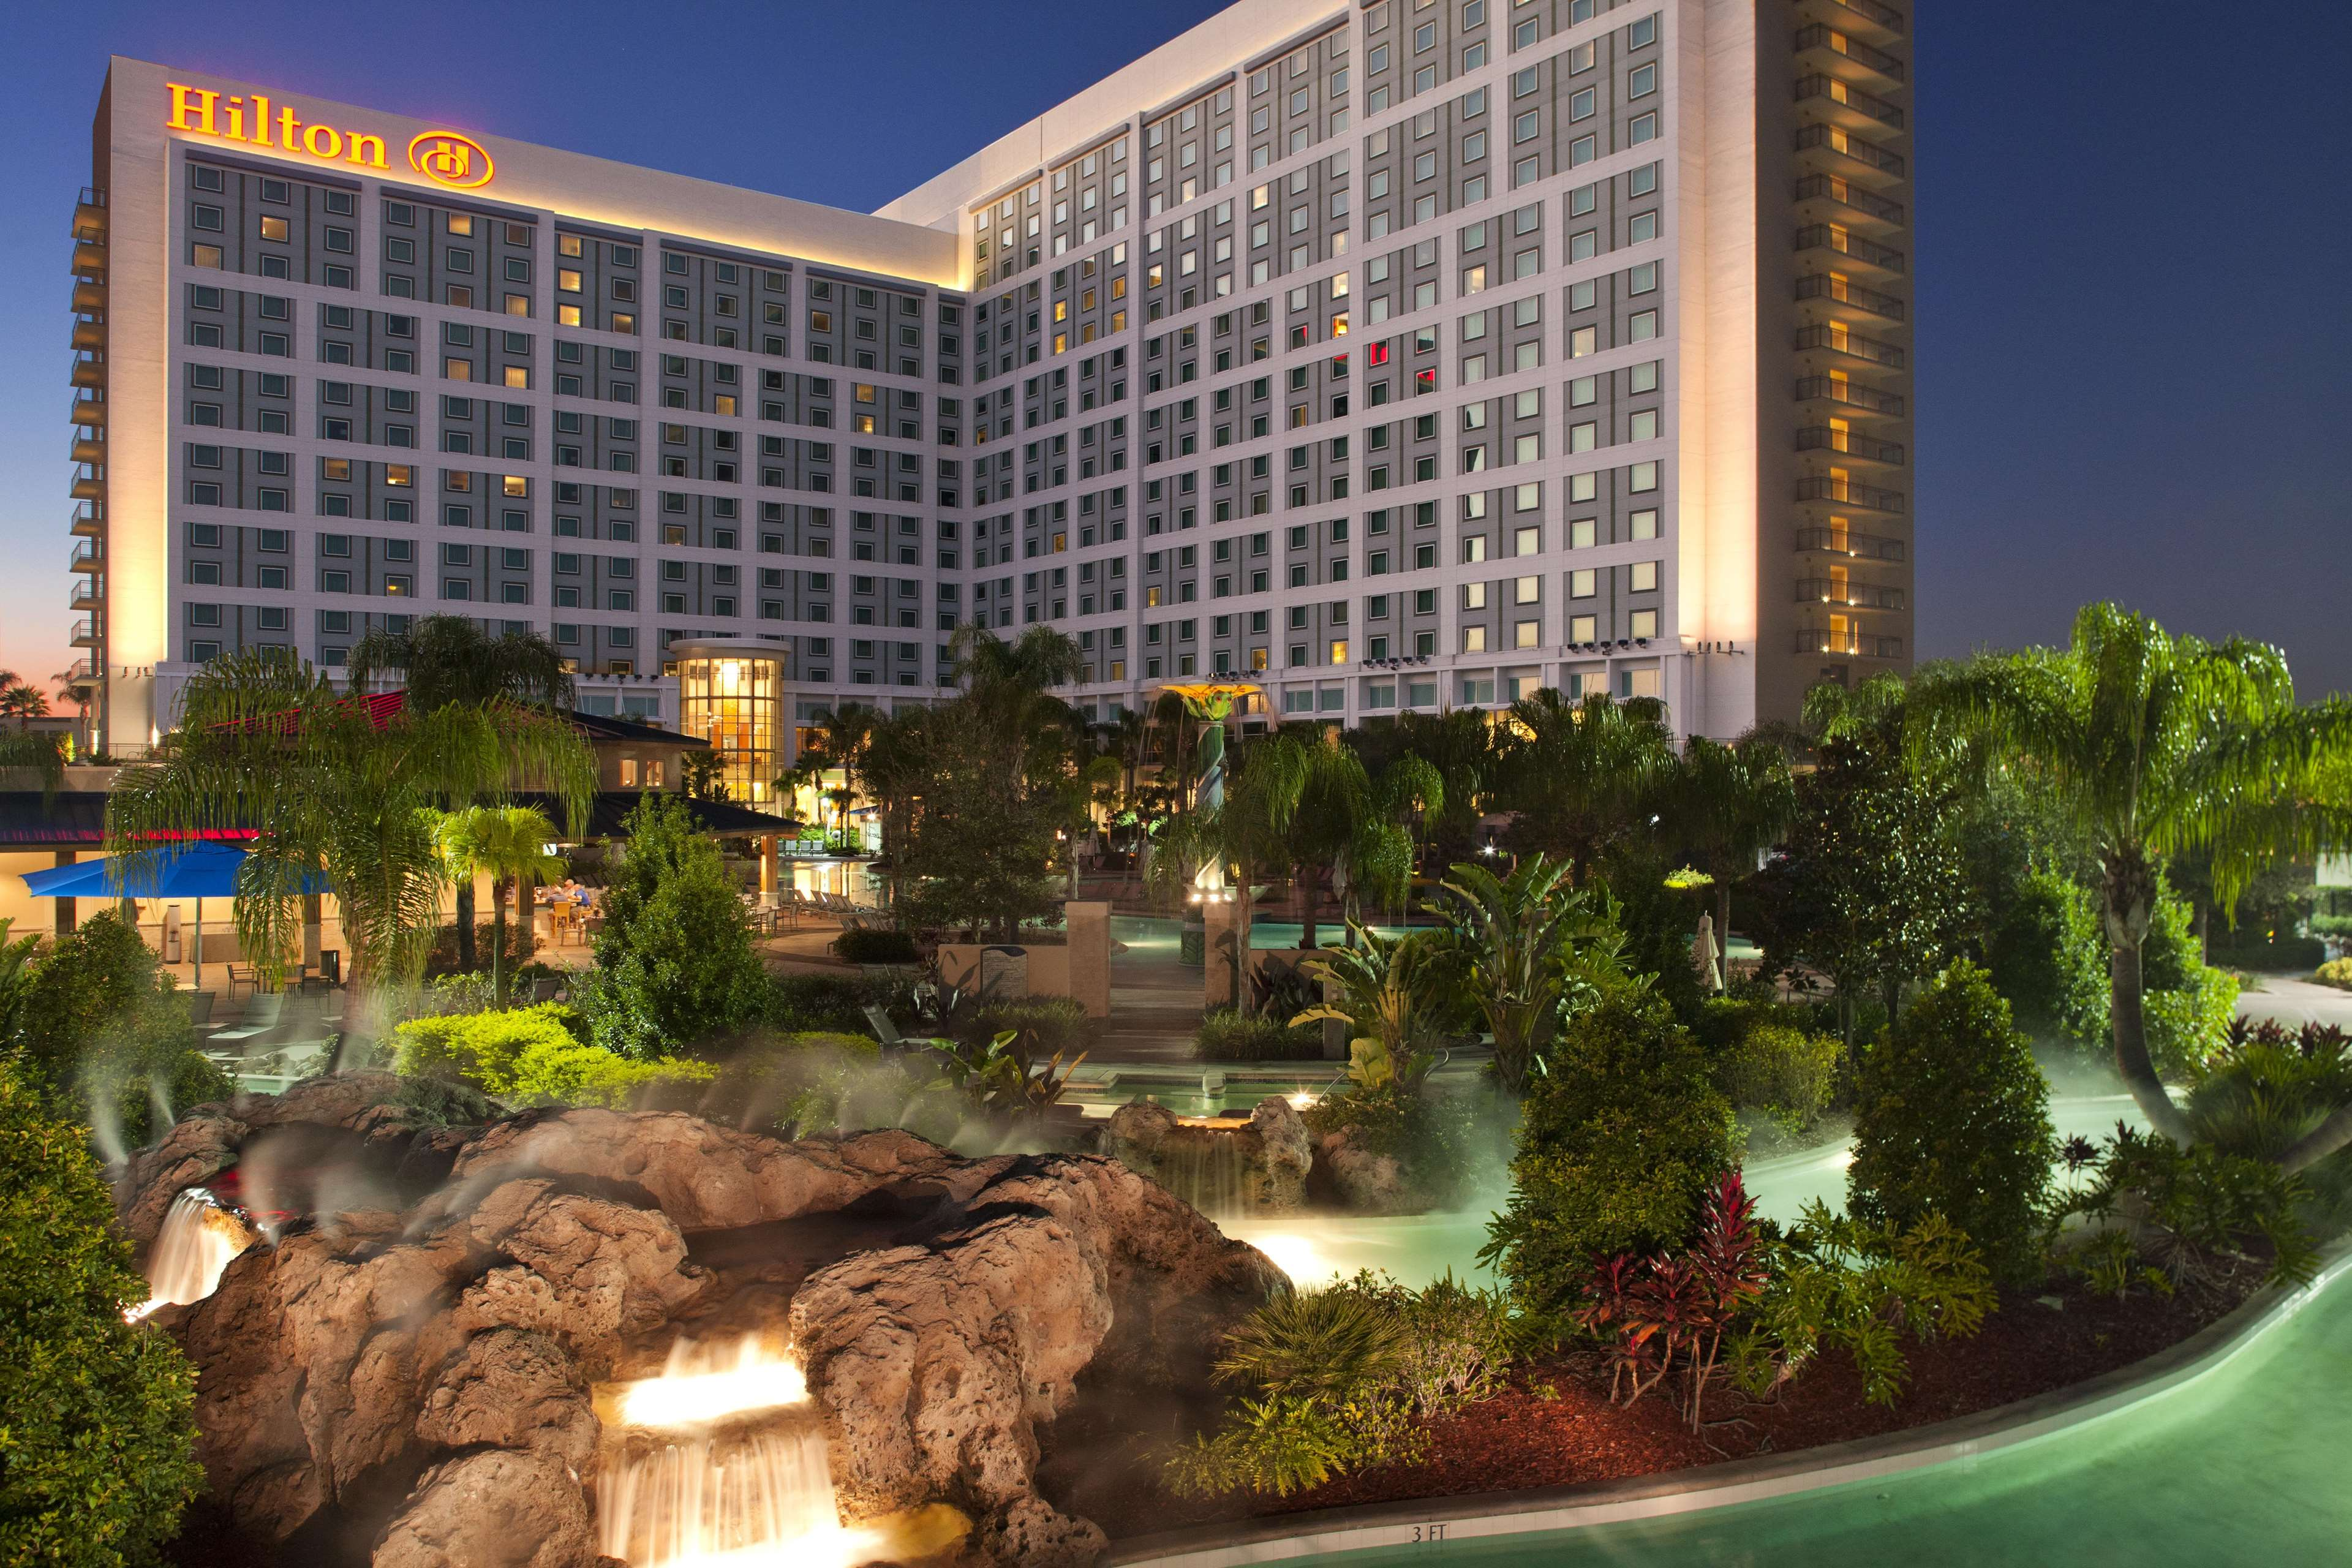 Hilton Orlando image 1